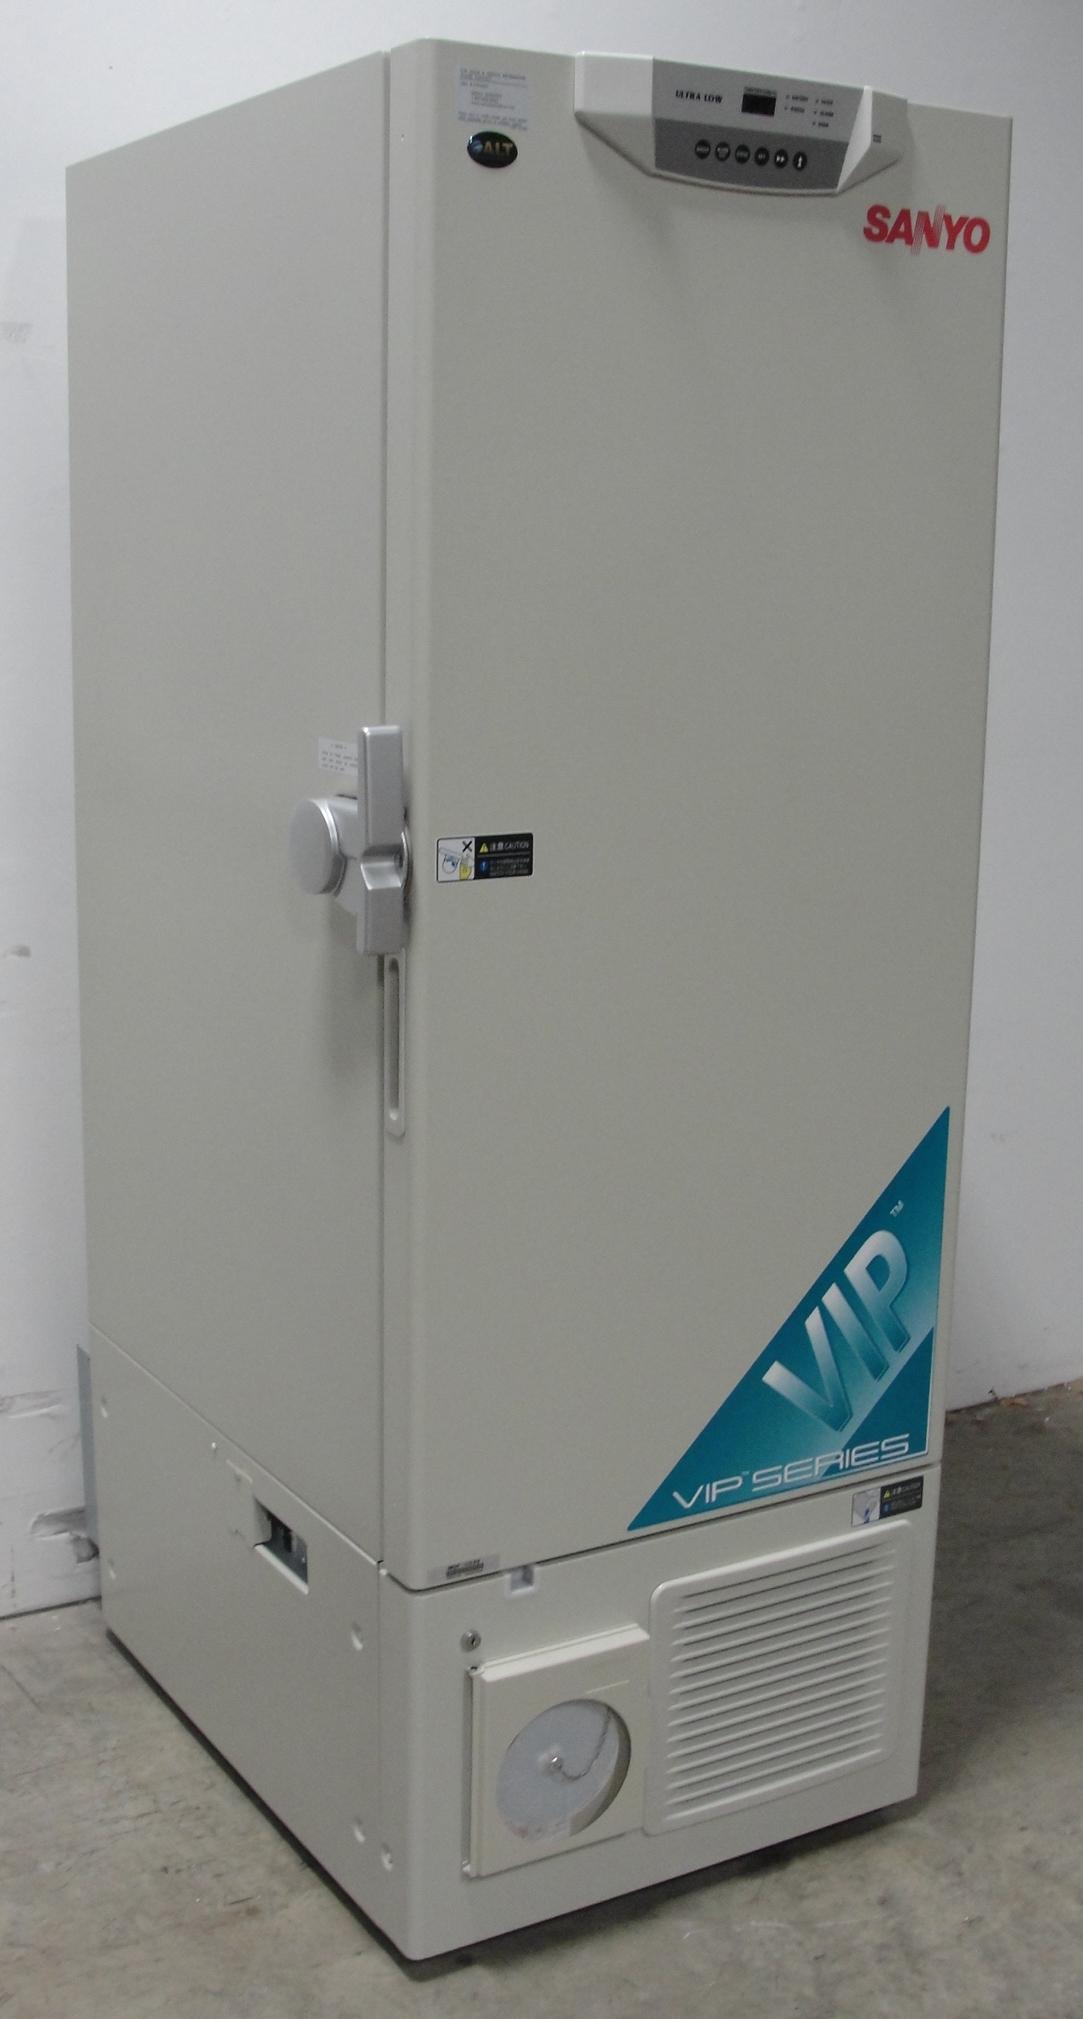 Sanyo VIP Series 86C Ultra Low Temperature Freezer Image